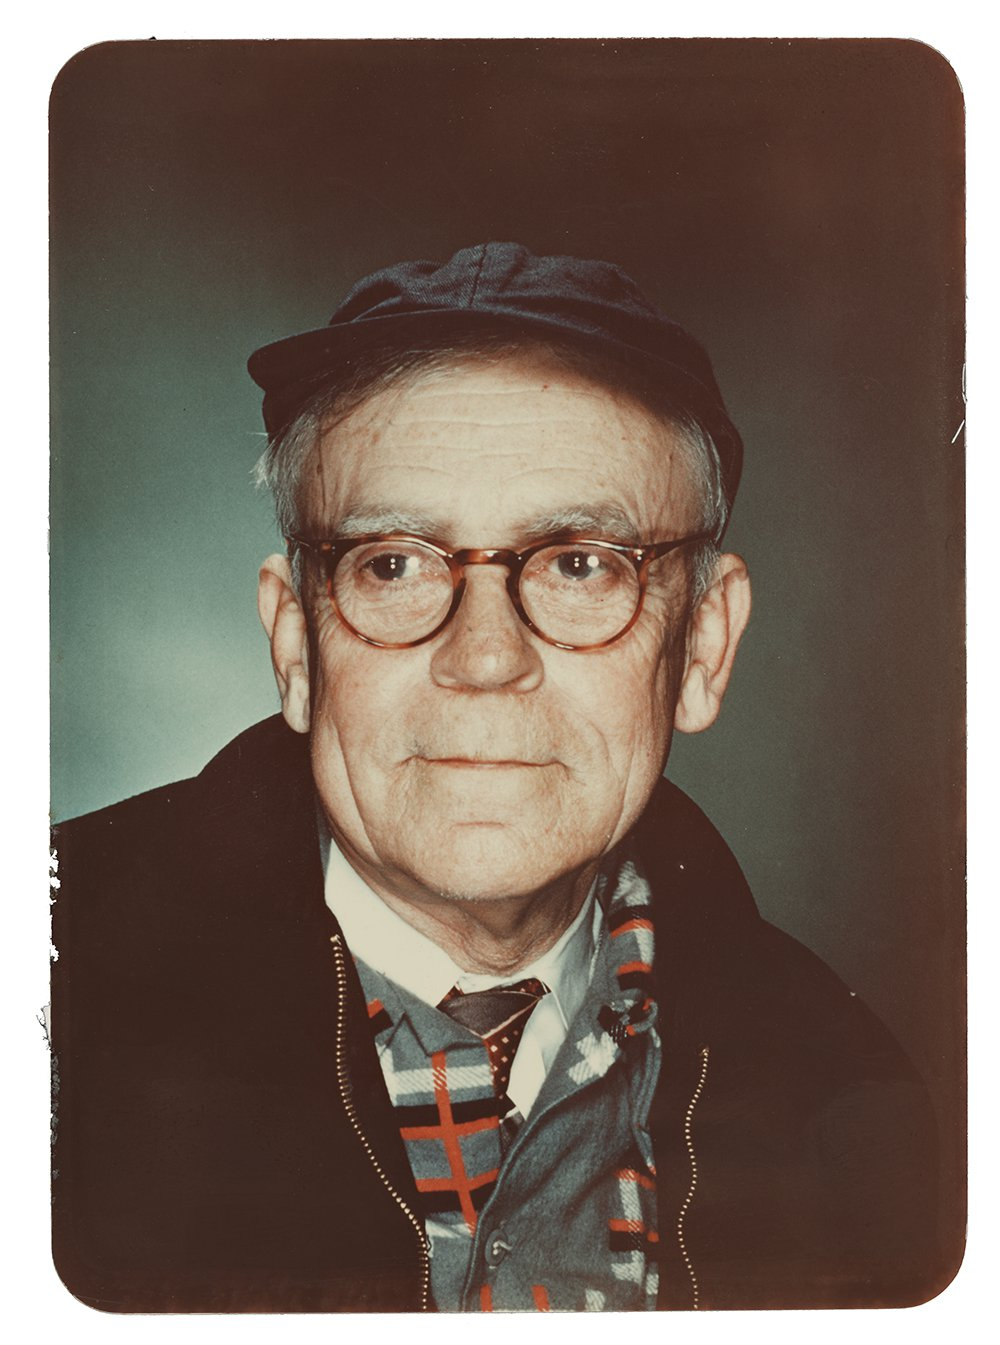 Photograph of Wood Gaylor